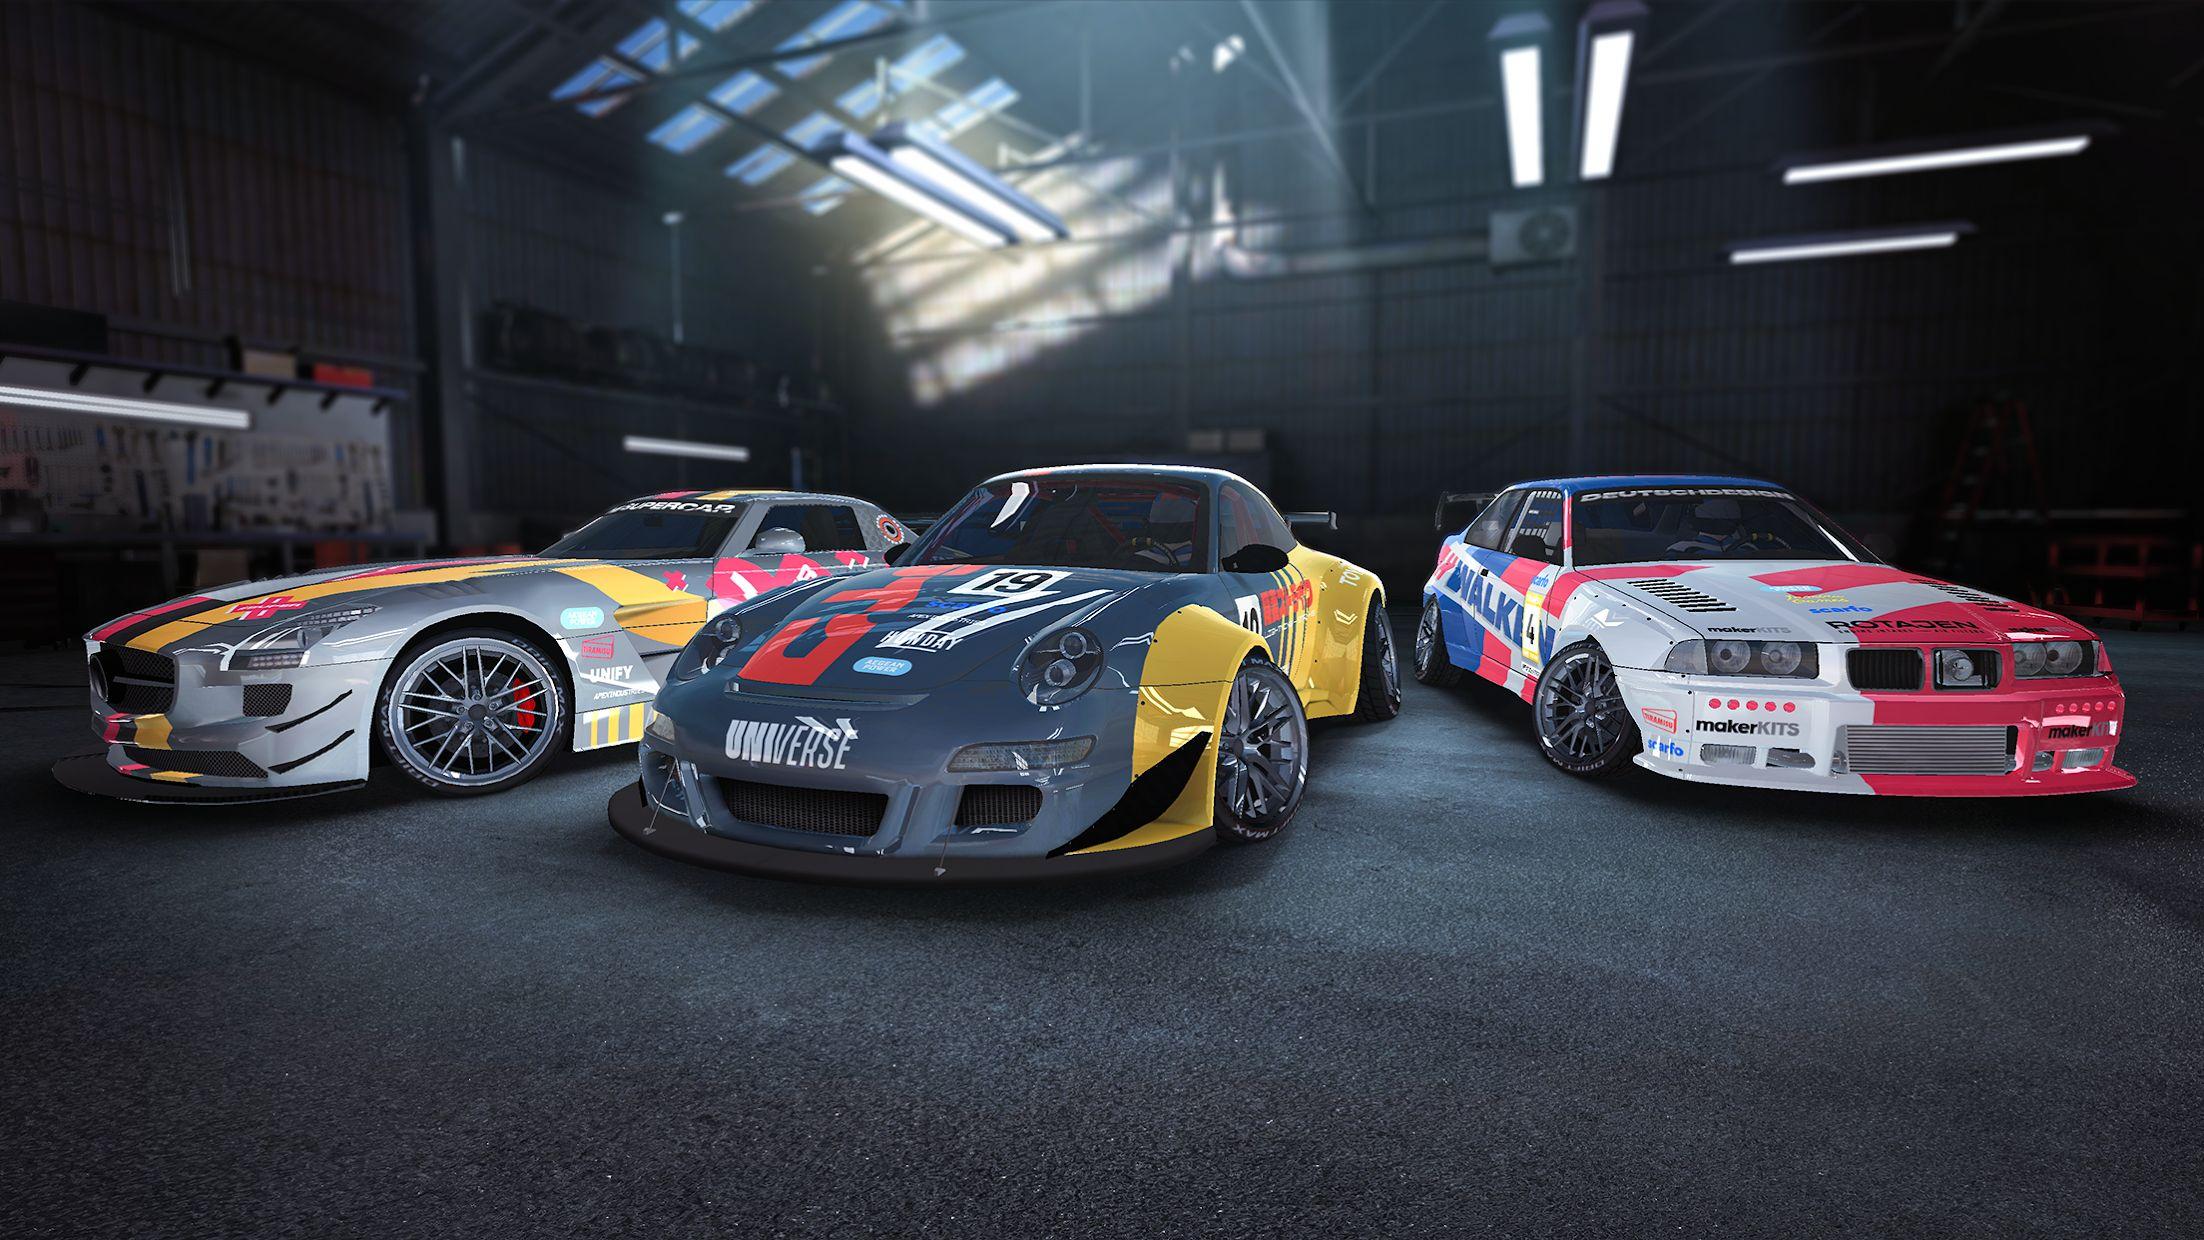 Drift Max Pro (极限漂移专家) - 赛车漂移游戏 游戏截图1